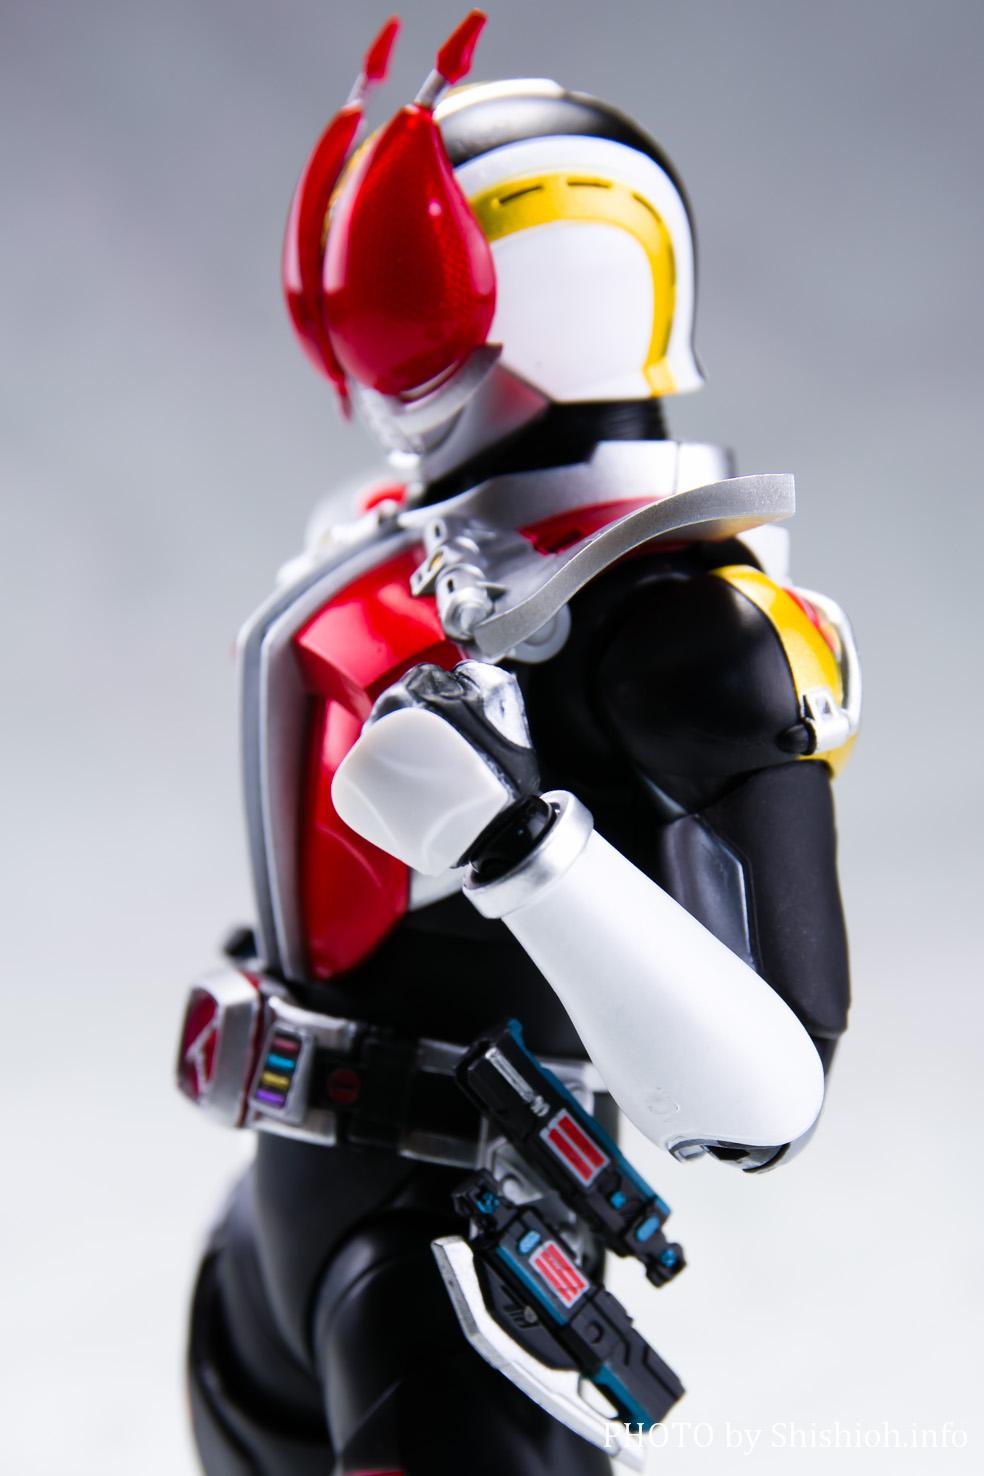 S.H.Figuarts(真骨彫製法) 仮面ライダー電王 ソードフォーム